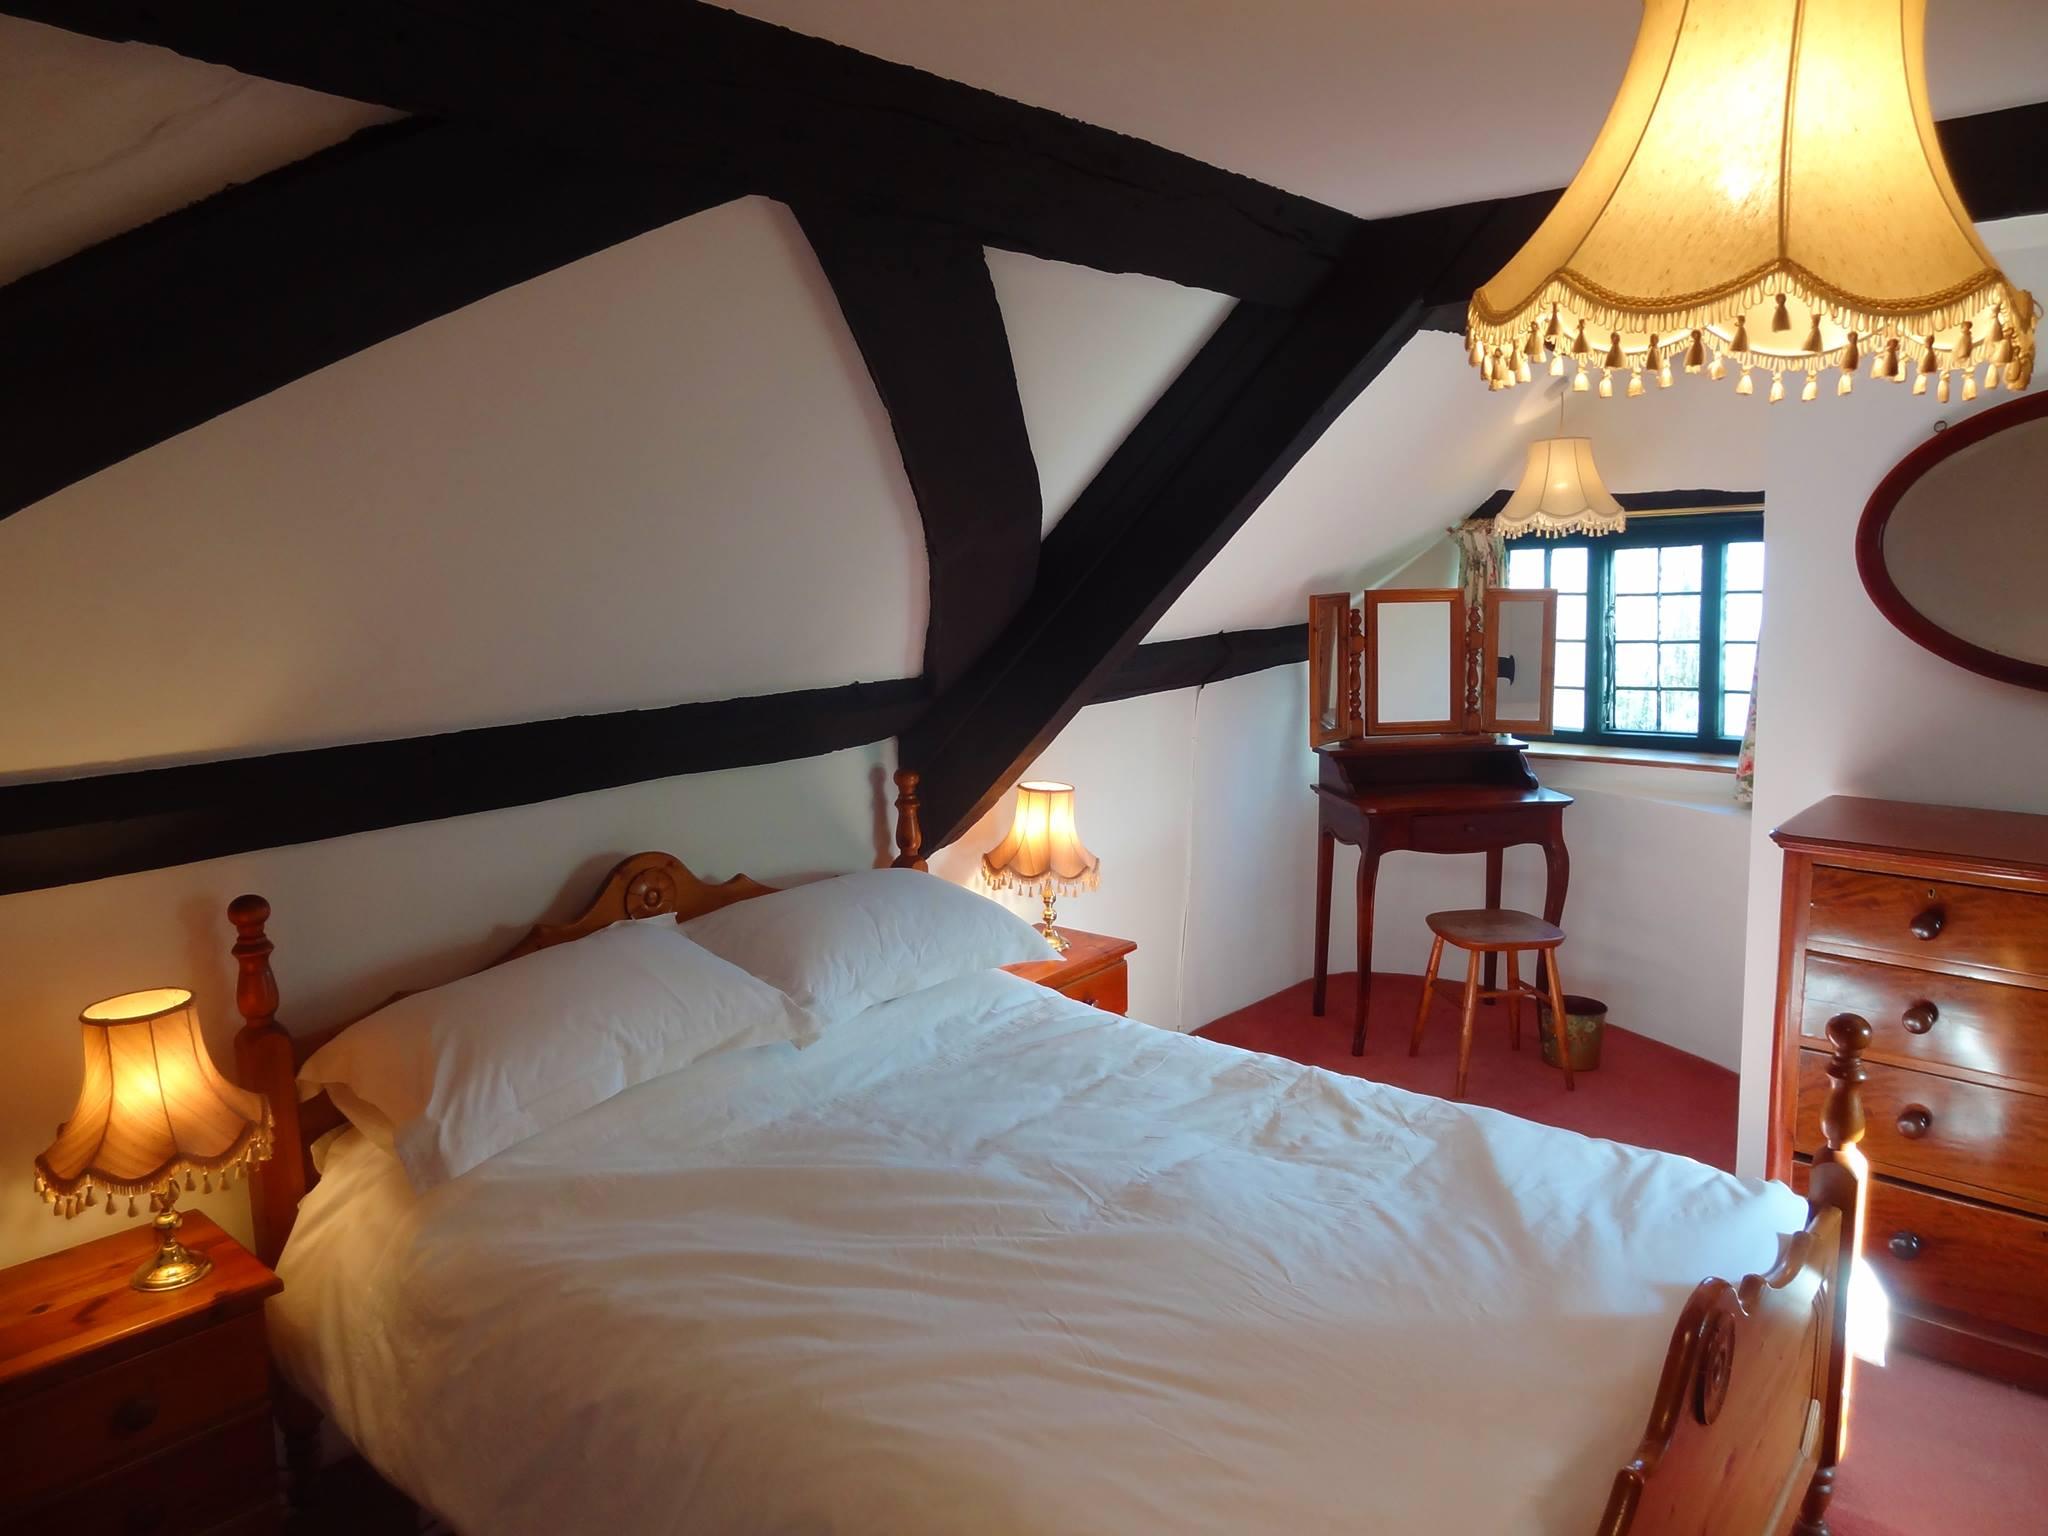 St Pancras Bedroom